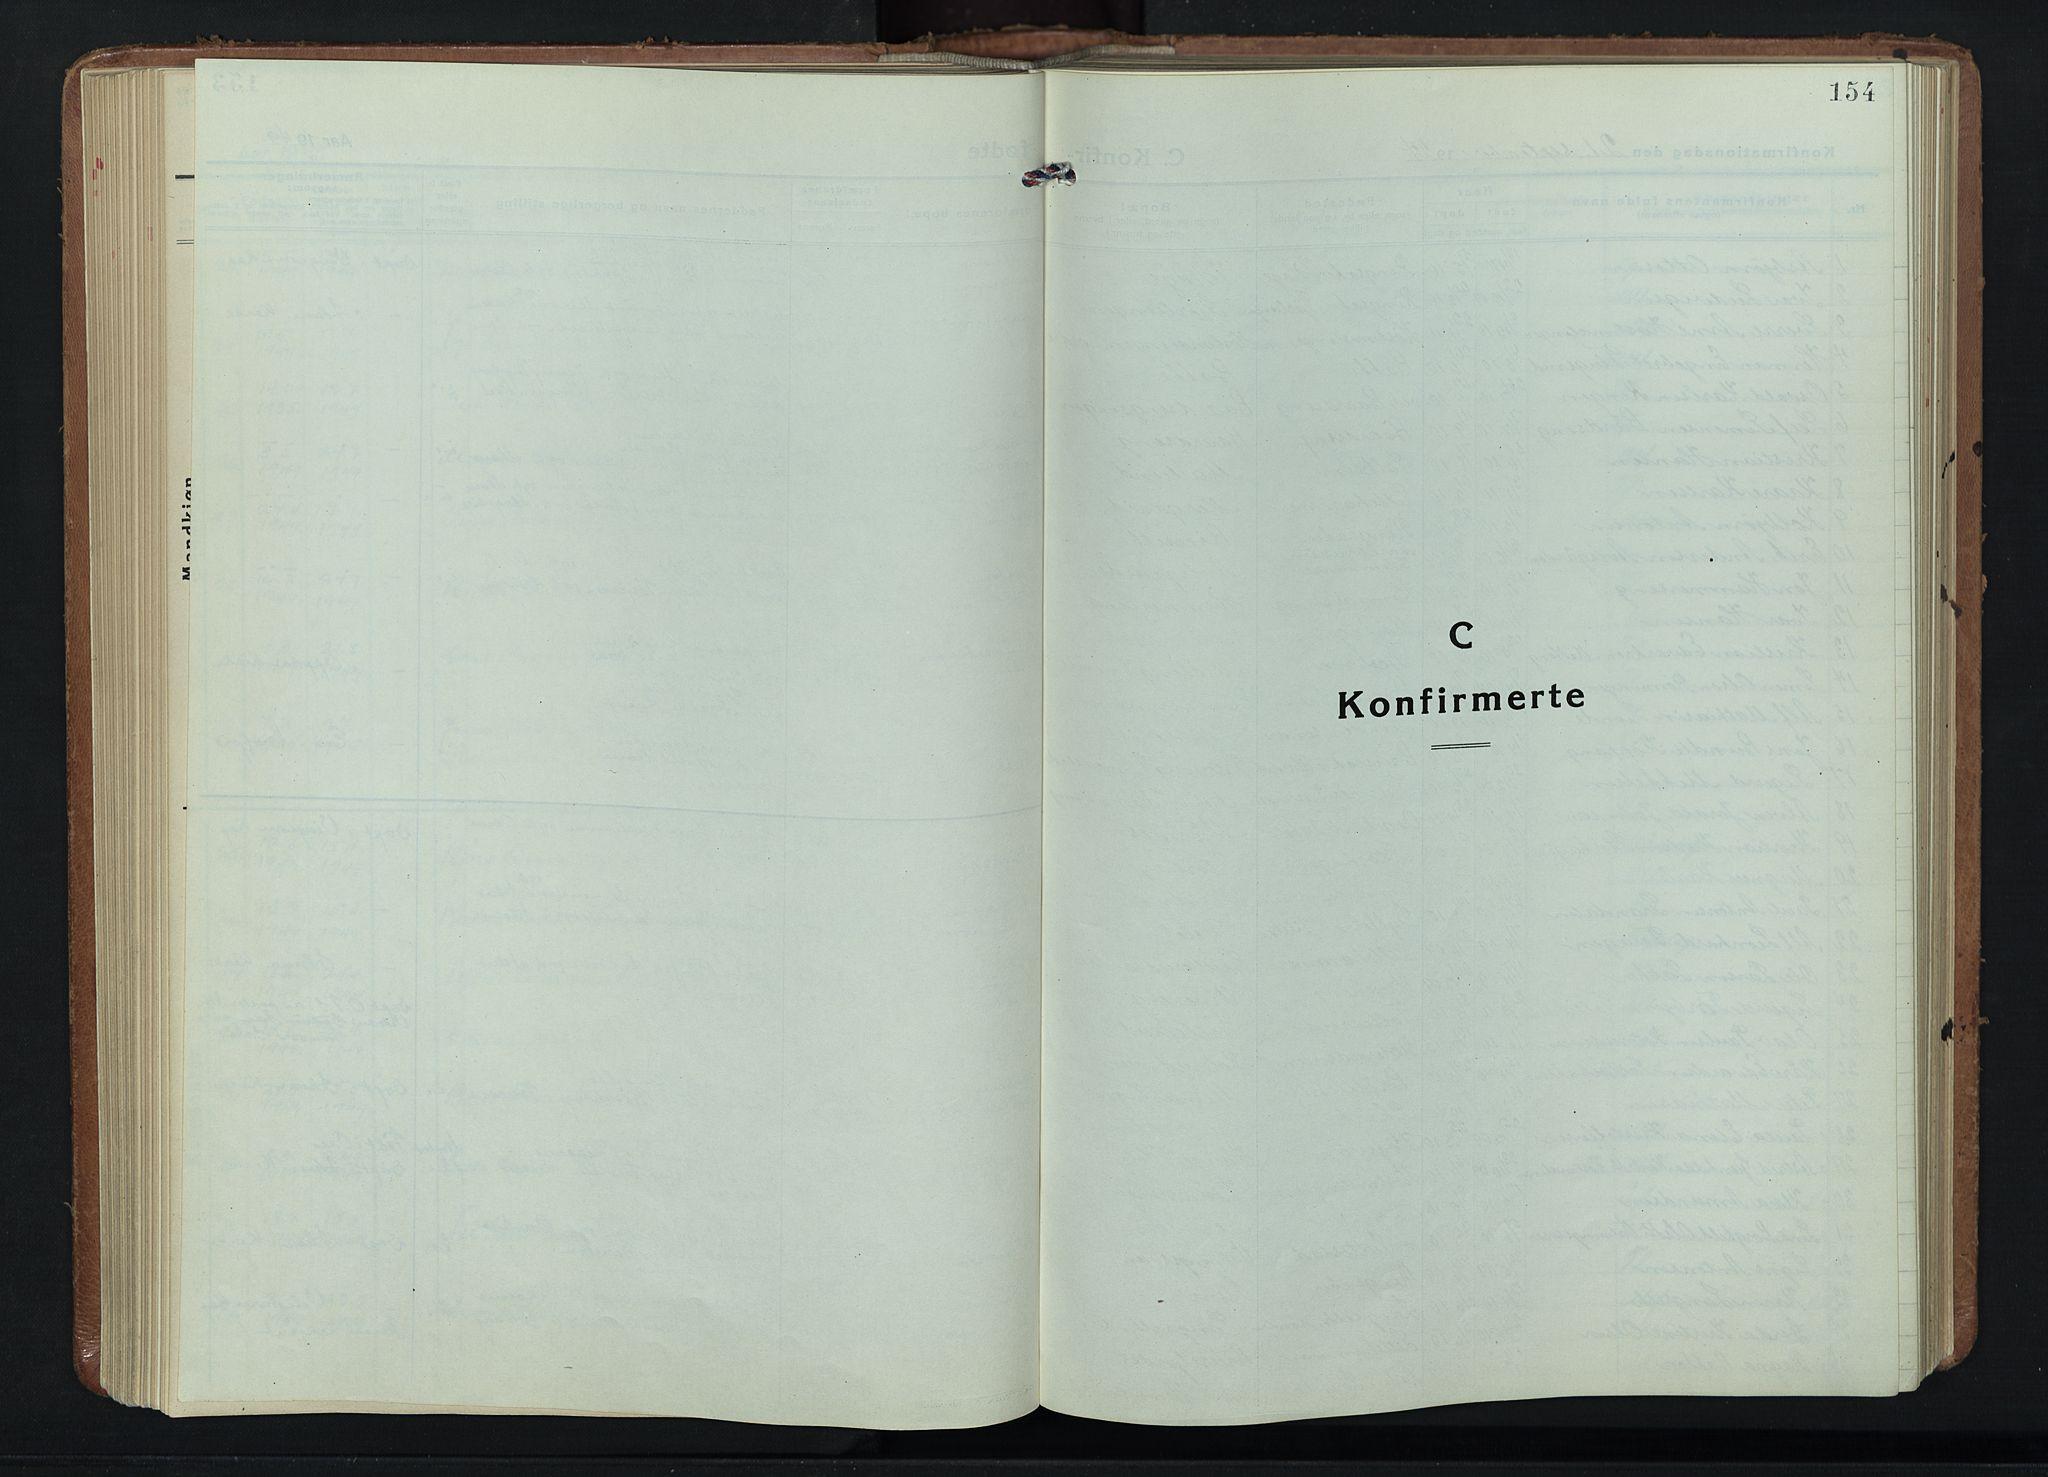 SAH, Fåberg prestekontor, H/Ha/Hab/L0015: Parish register (copy) no. 15, 1924-1949, p. 154